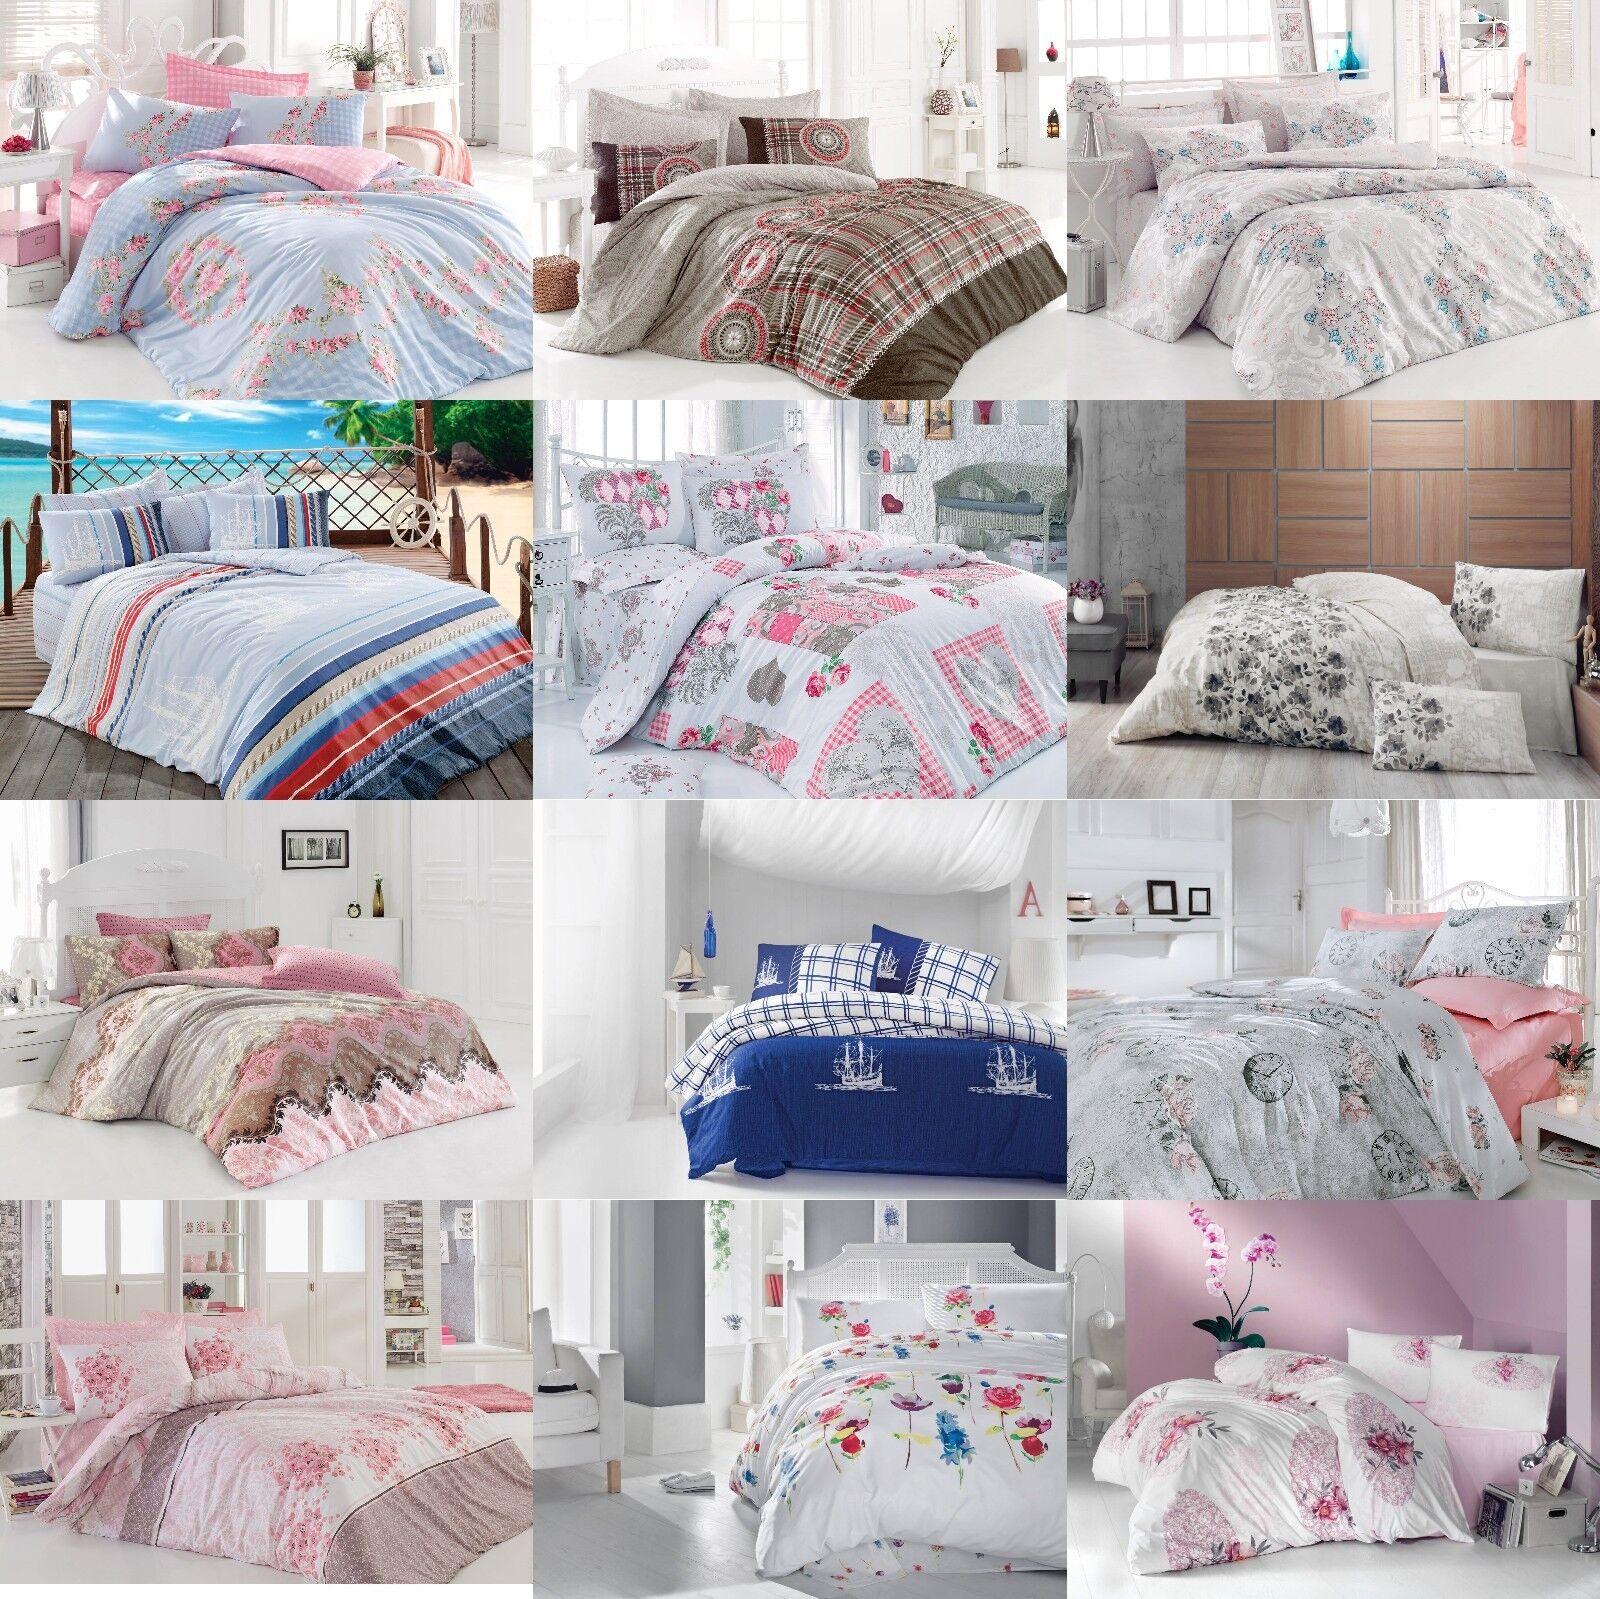 Floral Duvet Cover 100% Cotton Soft Bedding Set Reversible Queen King